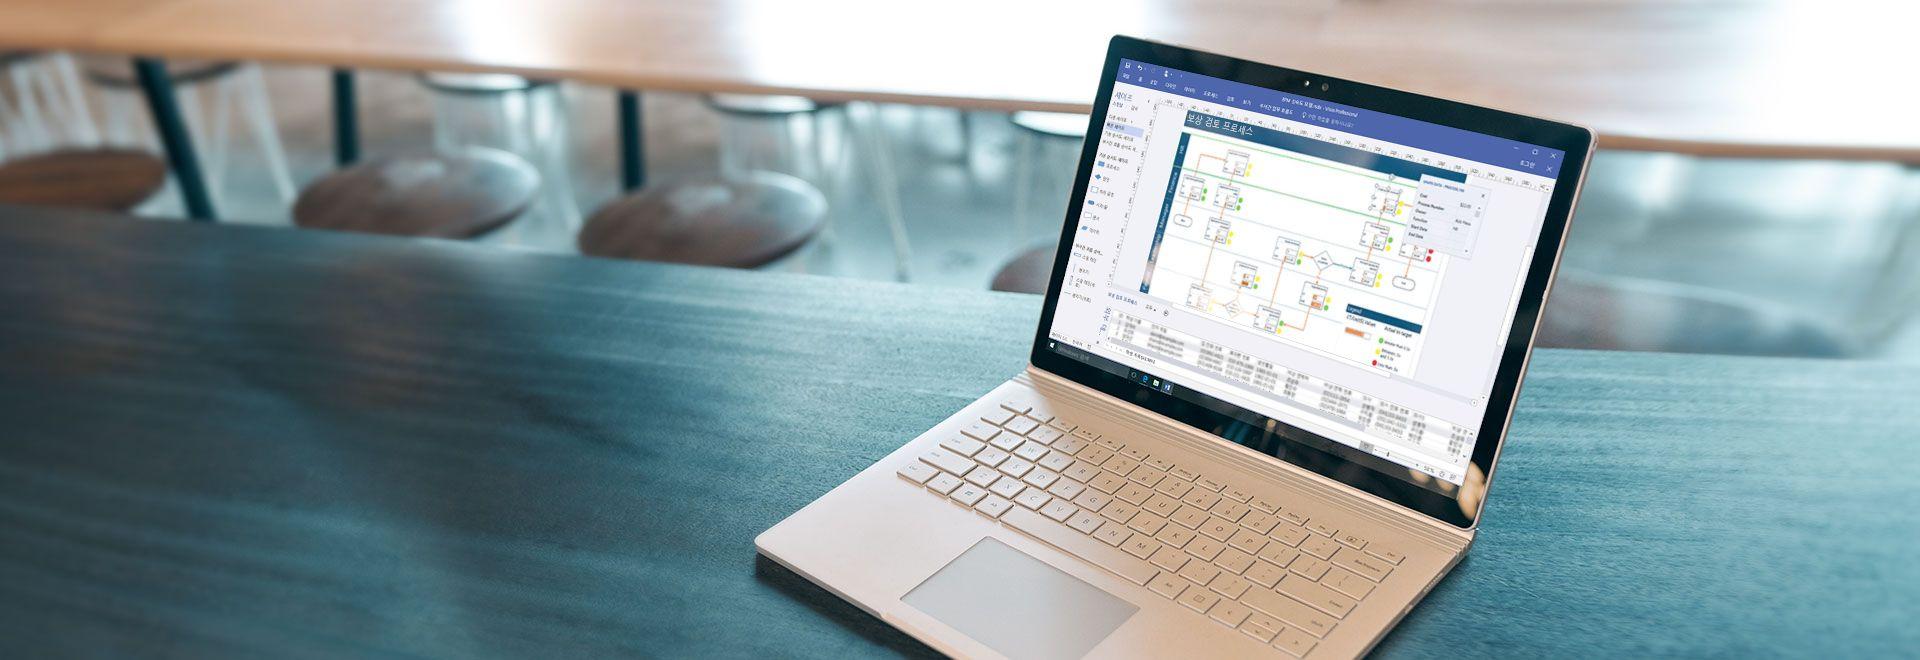 Visio Pro for Office 365의 프로세스 워크플로 다이어그램을 표시하는 노트북